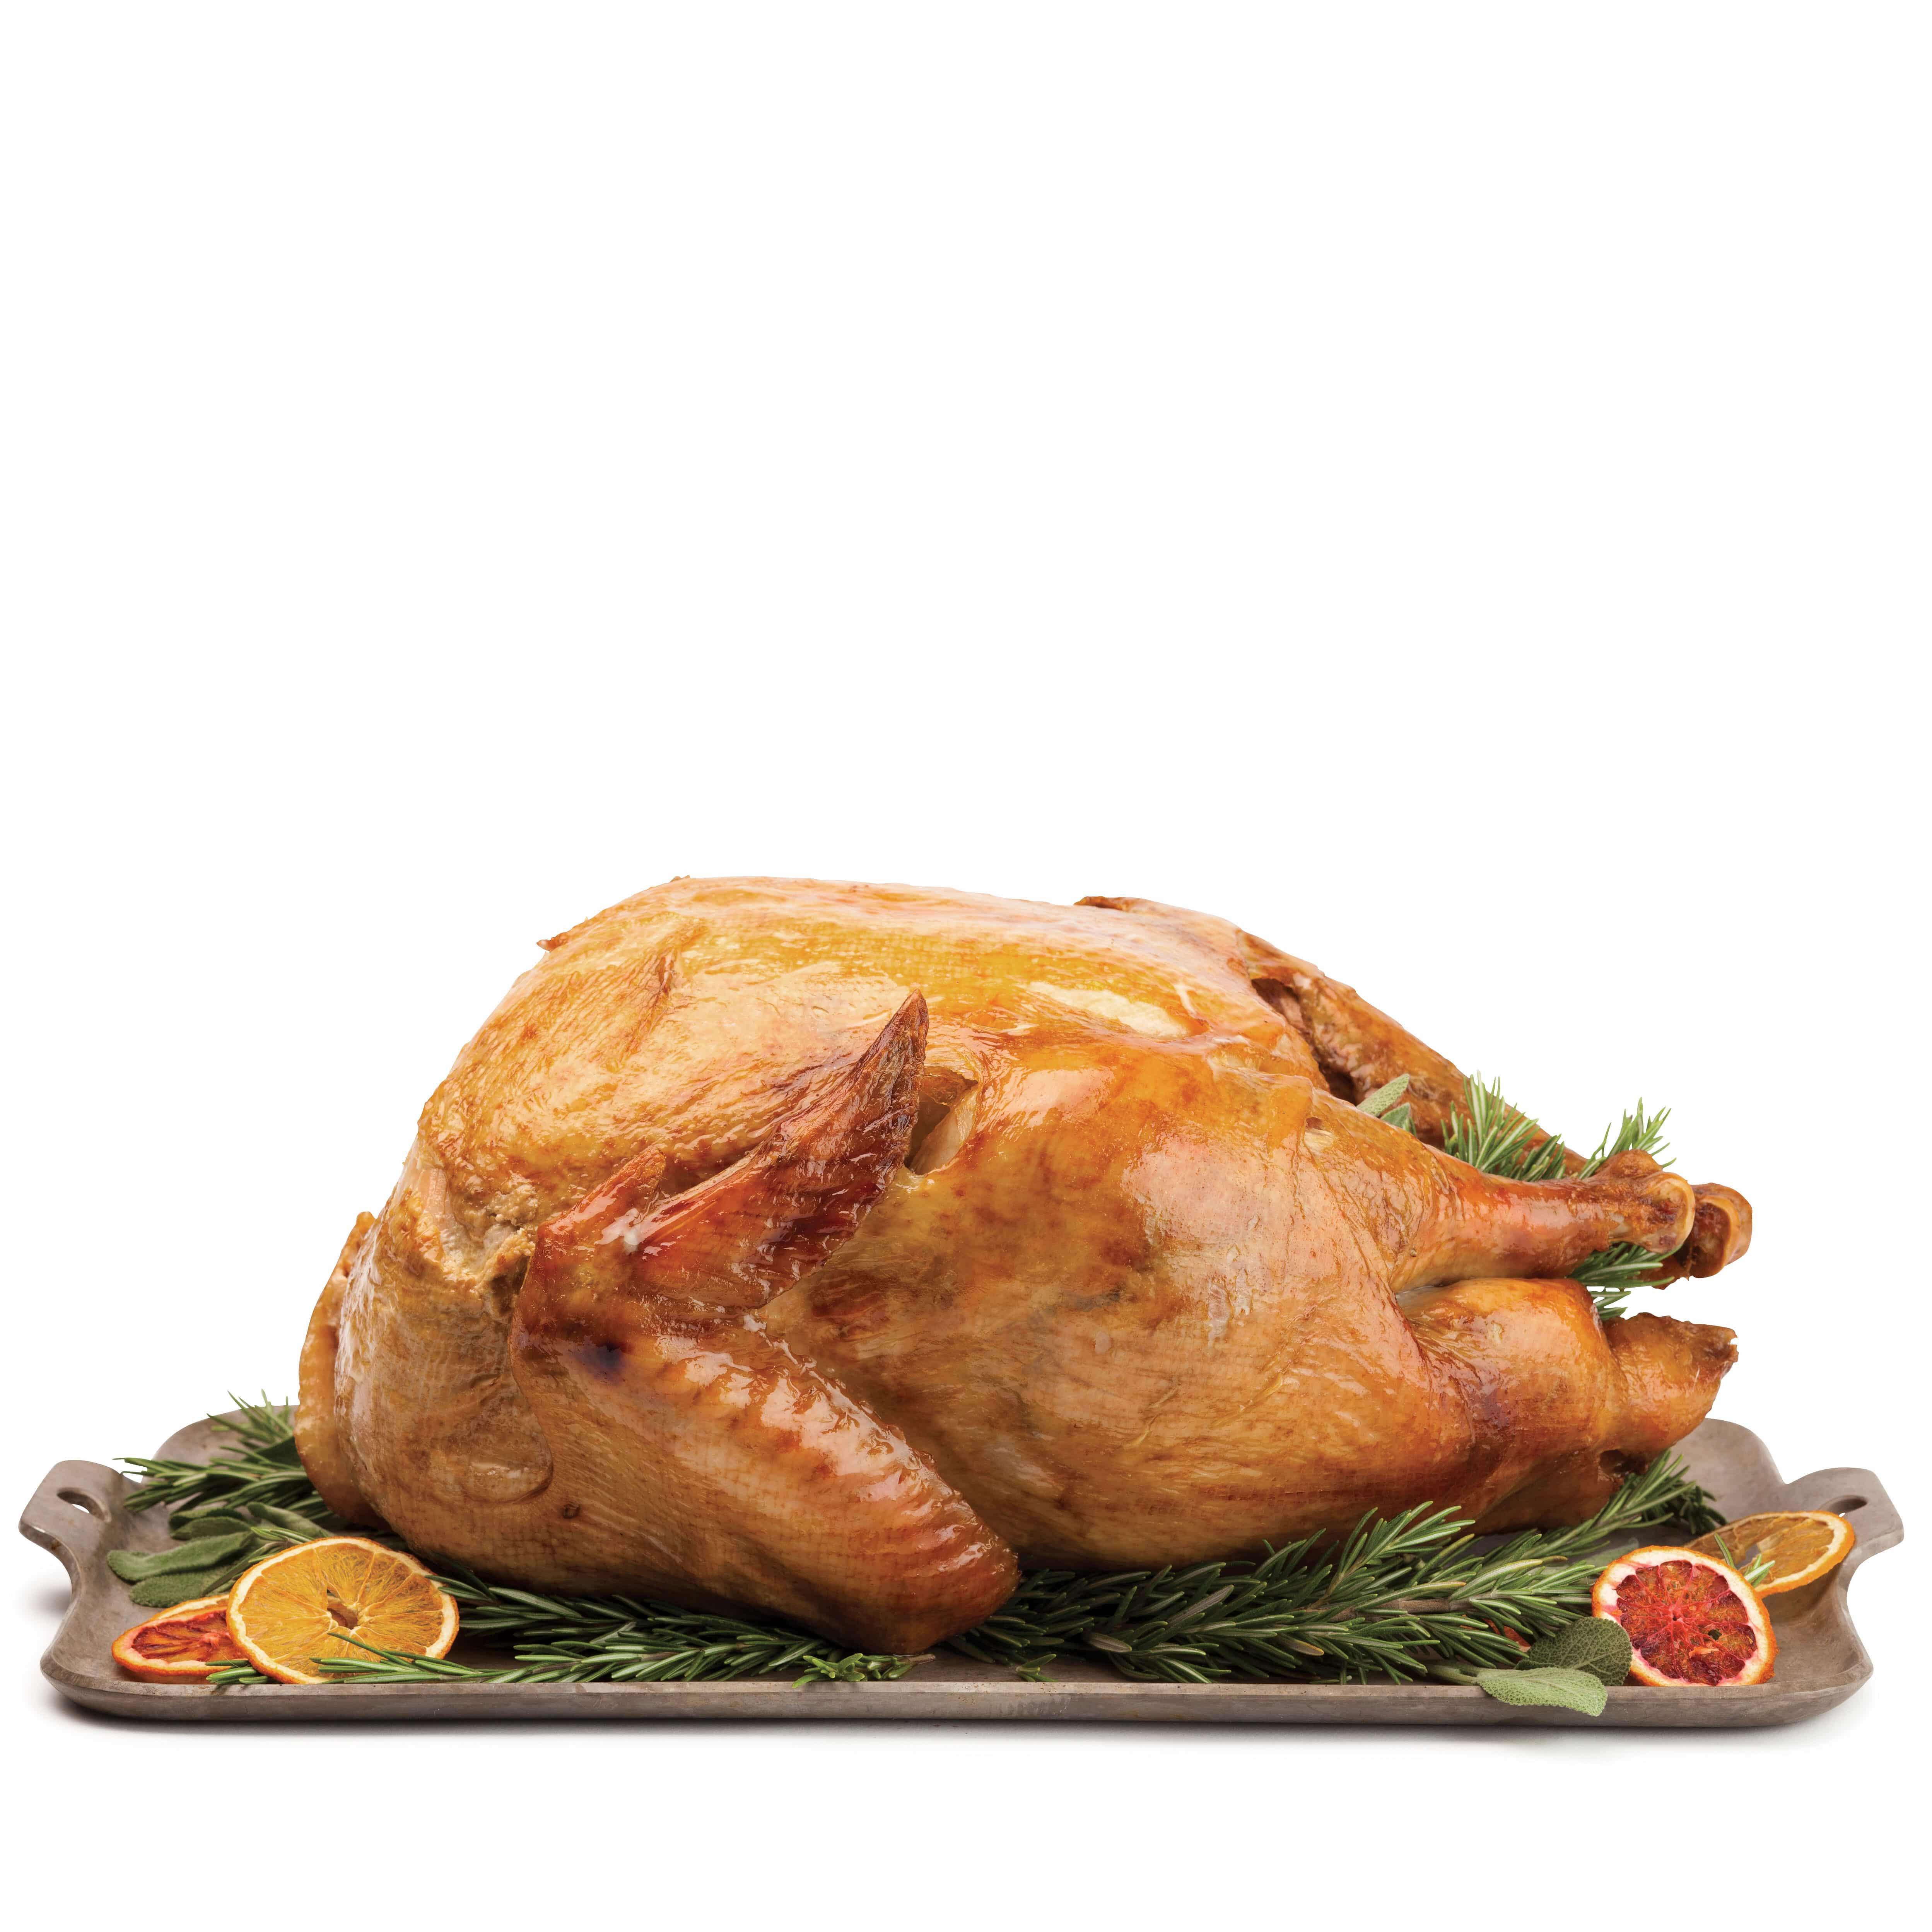 Order Cooked Thanksgiving Turkey  Cheatsgiving How To Order Thanksgiving Turkey